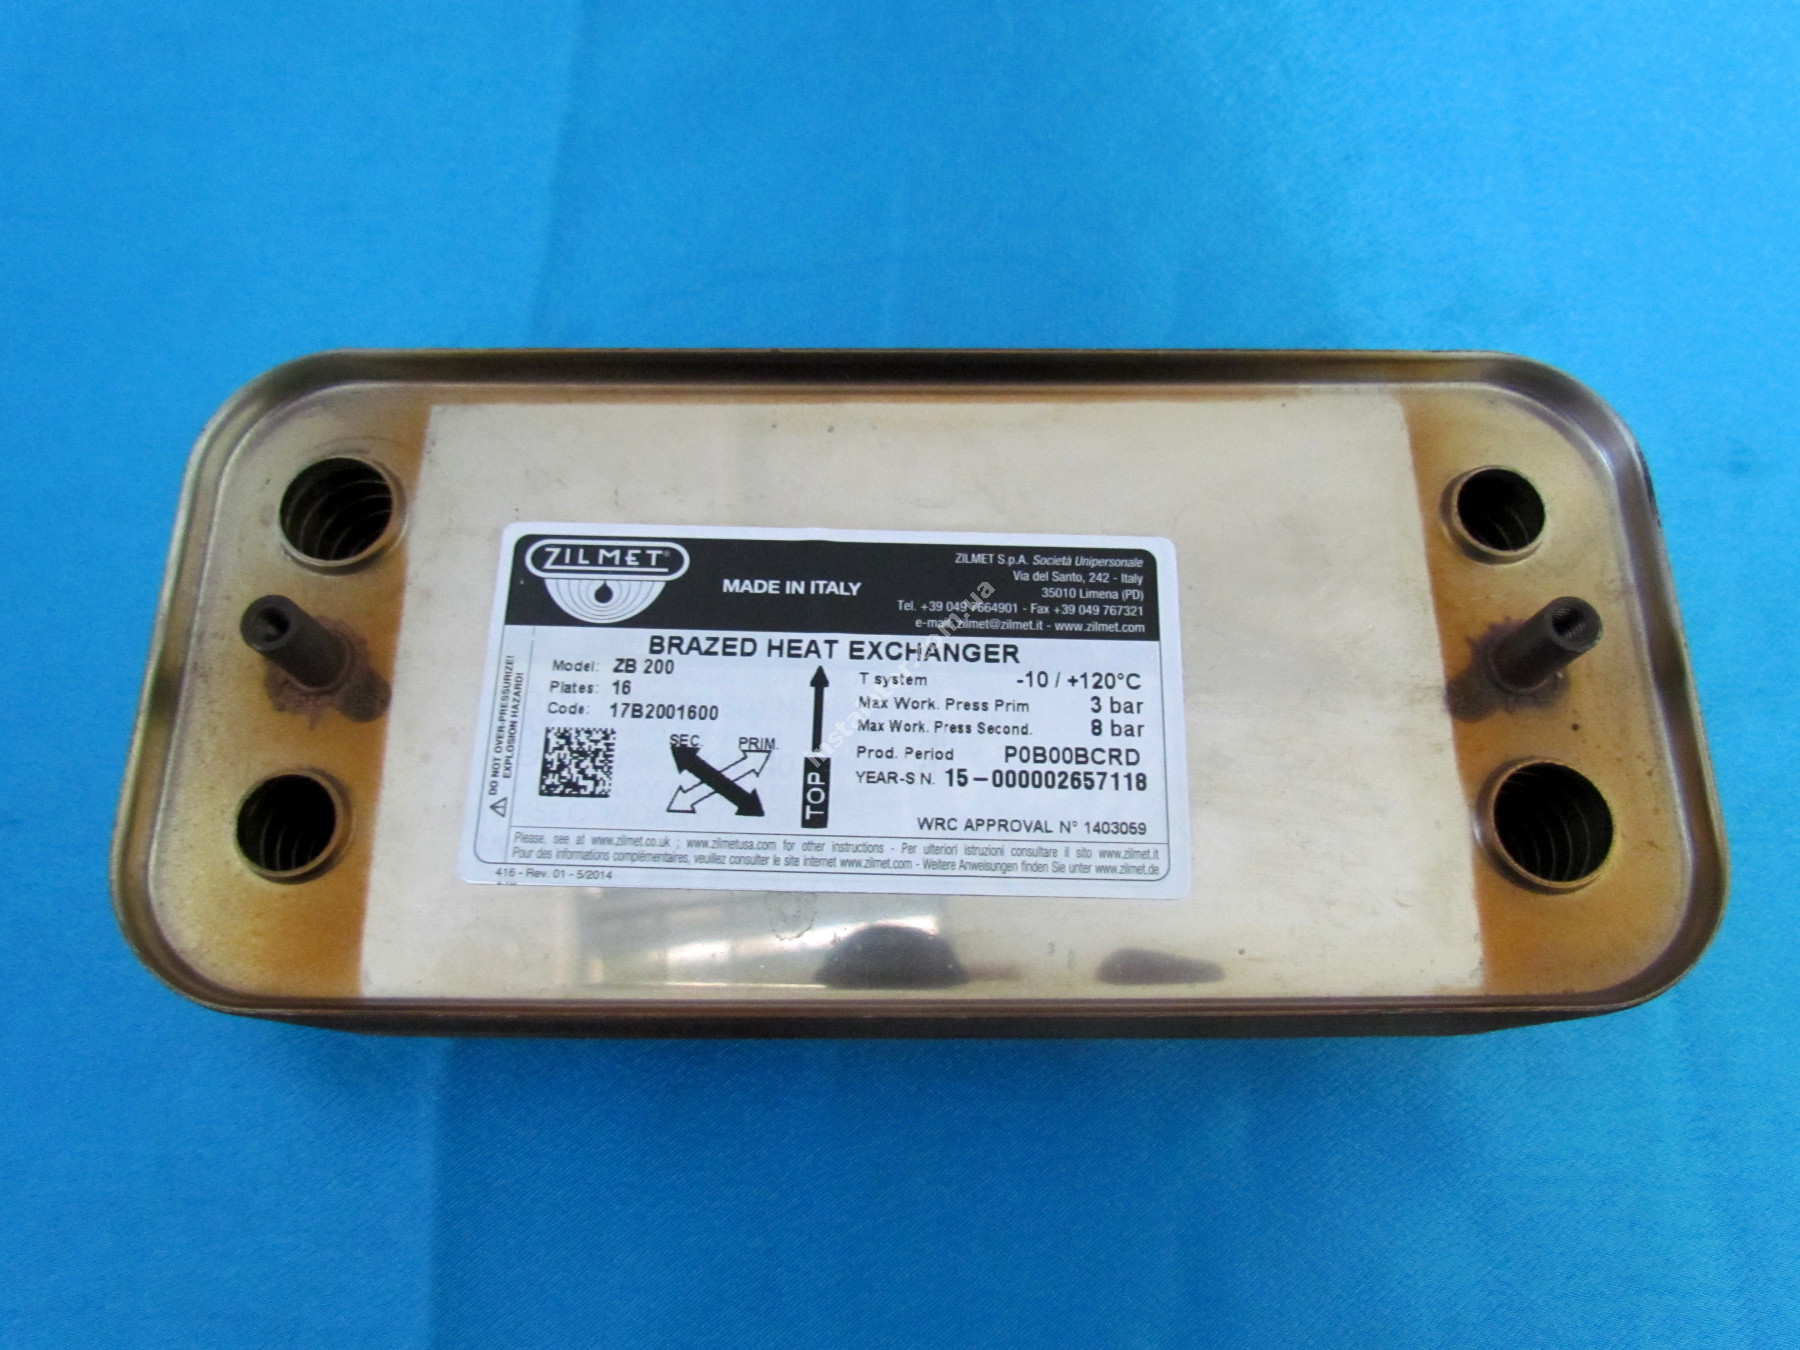 17B2001600 Теплообмінник вторинний ГВП 16 пластин IMMERGAS Maior kw, Superior ZILMET full-image-1